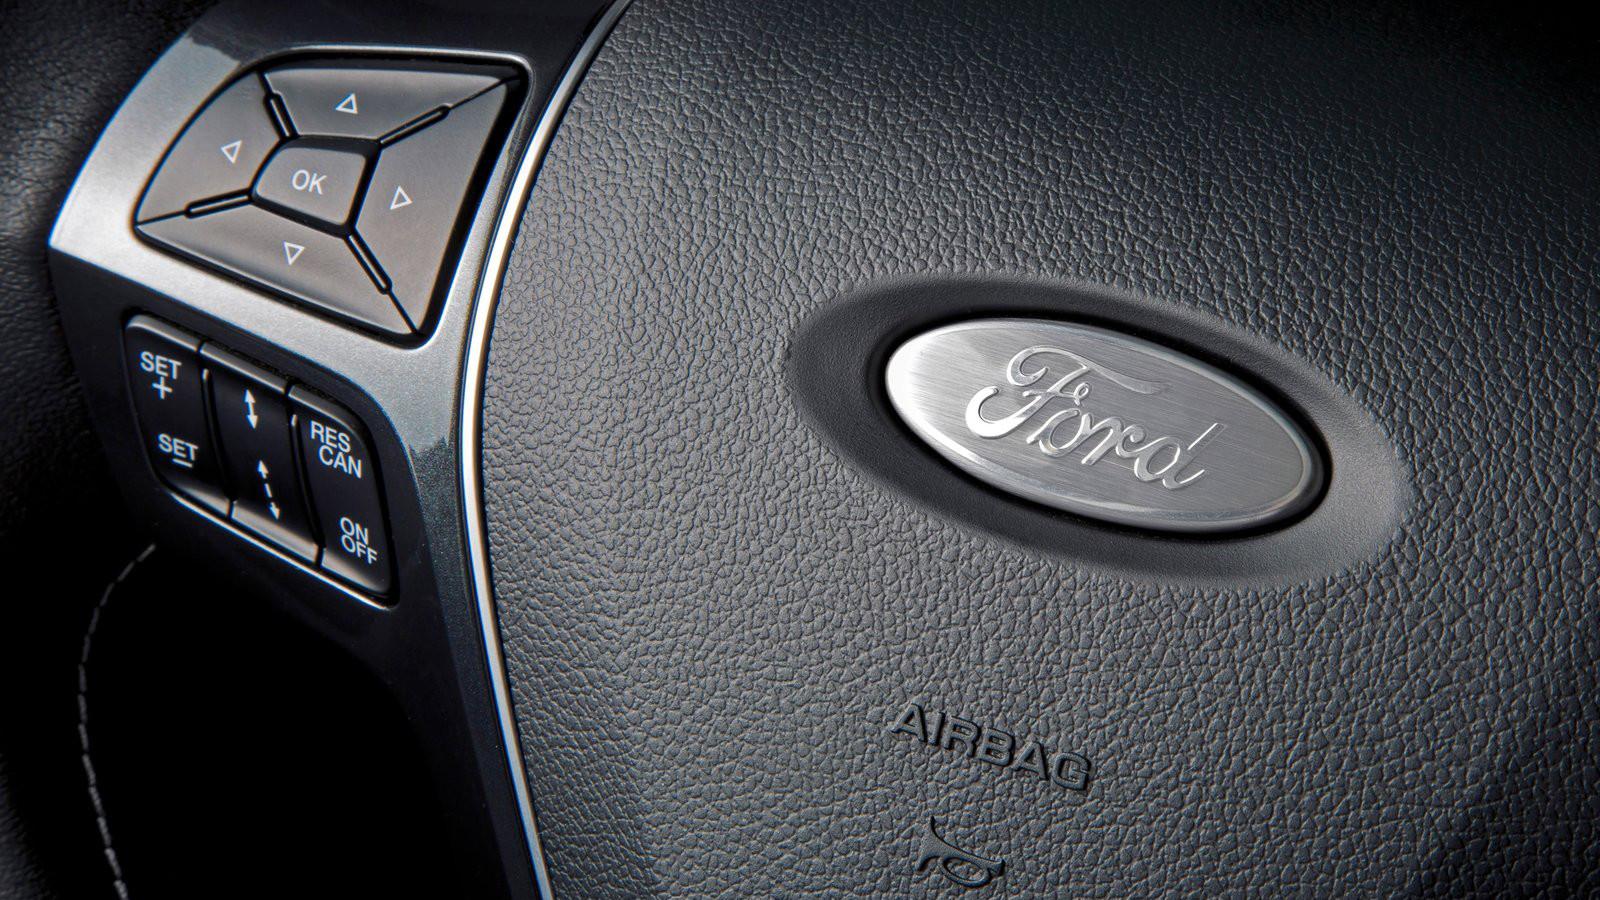 Форд наймет служащих BlackBerry для разработки интернет-технологий для авто